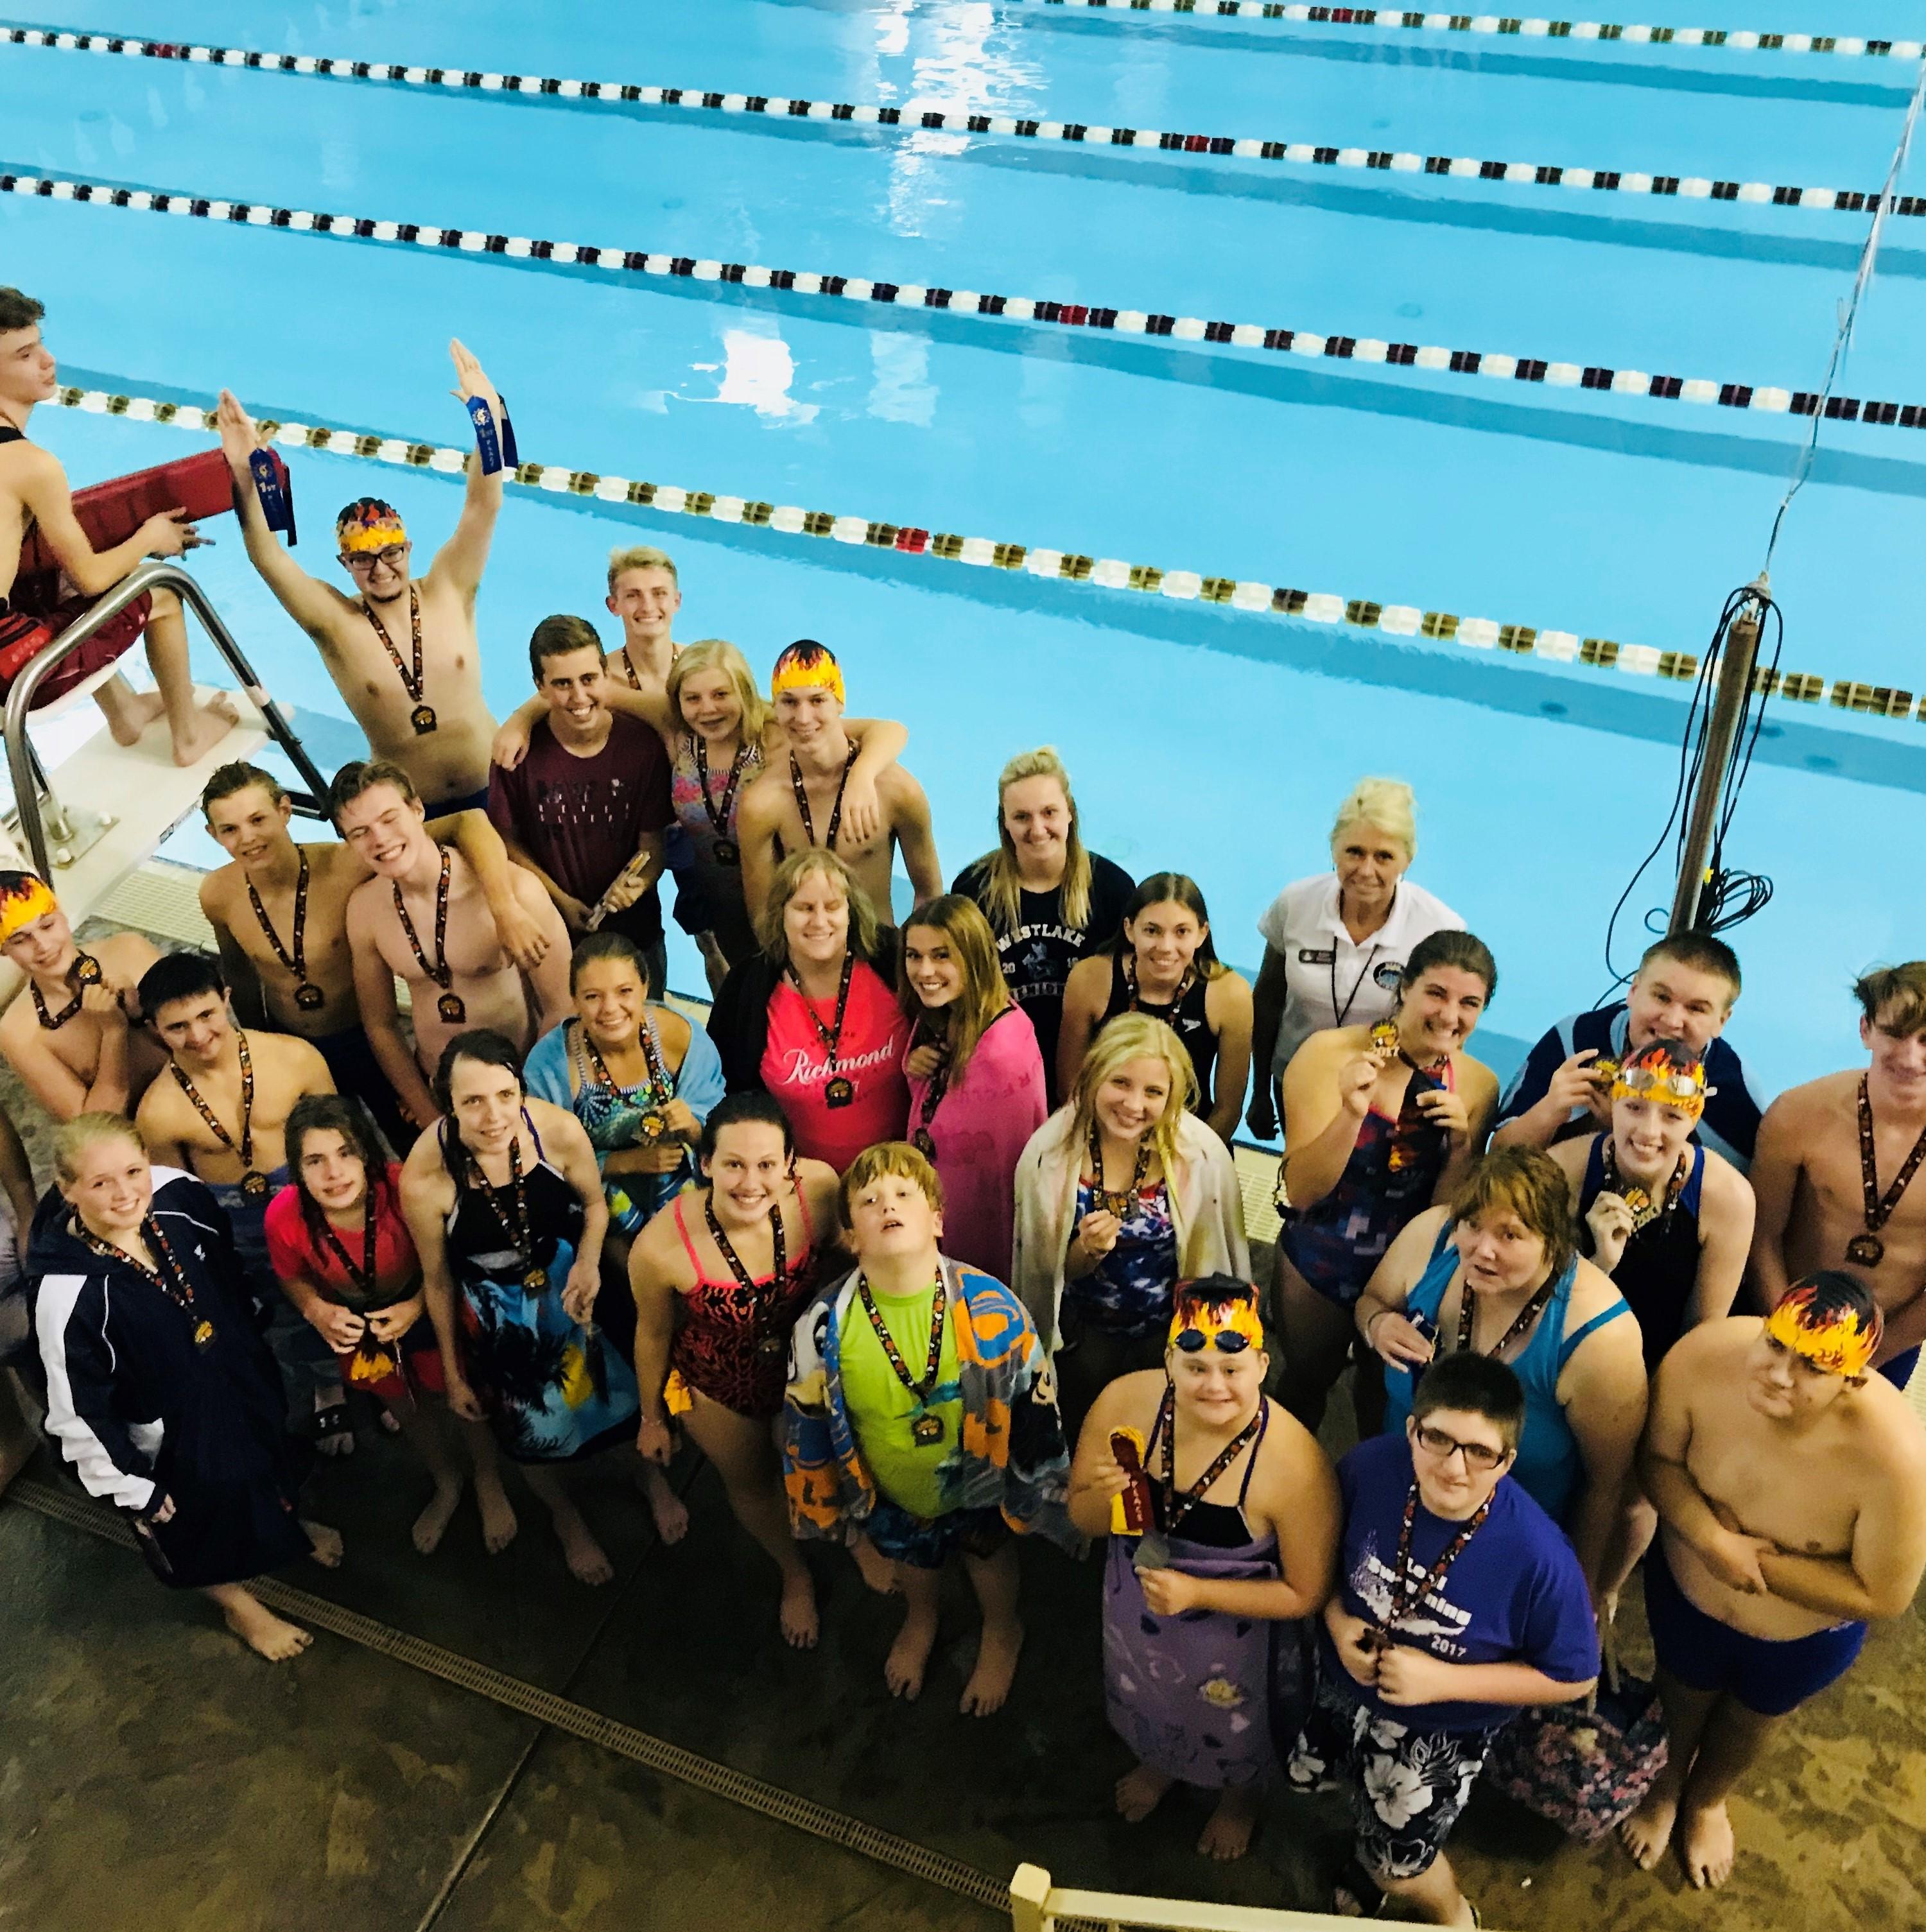 Adaptive swim team participants next to pool